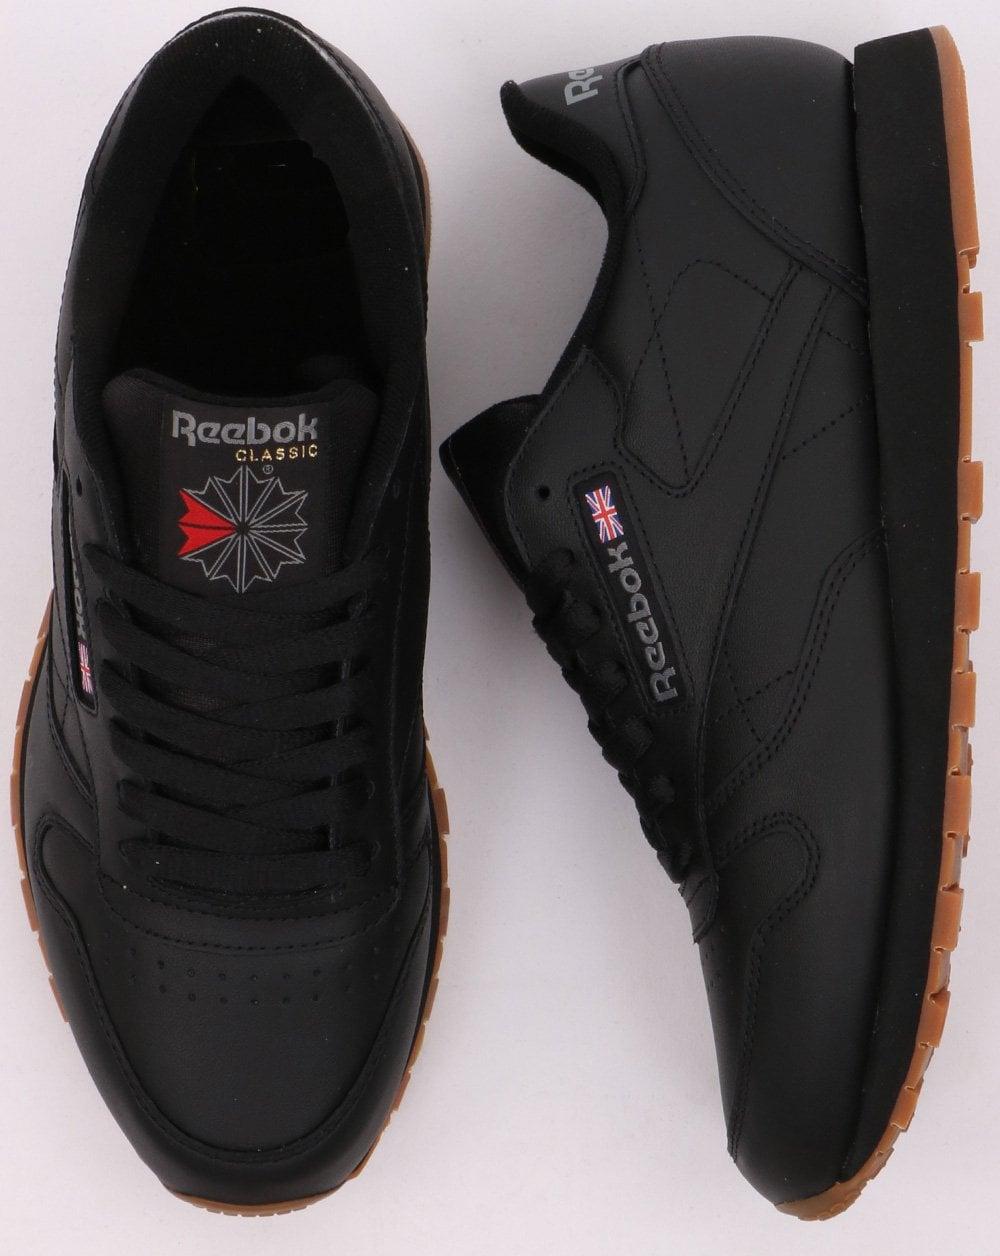 Reebok Classic Leather Gum Sole